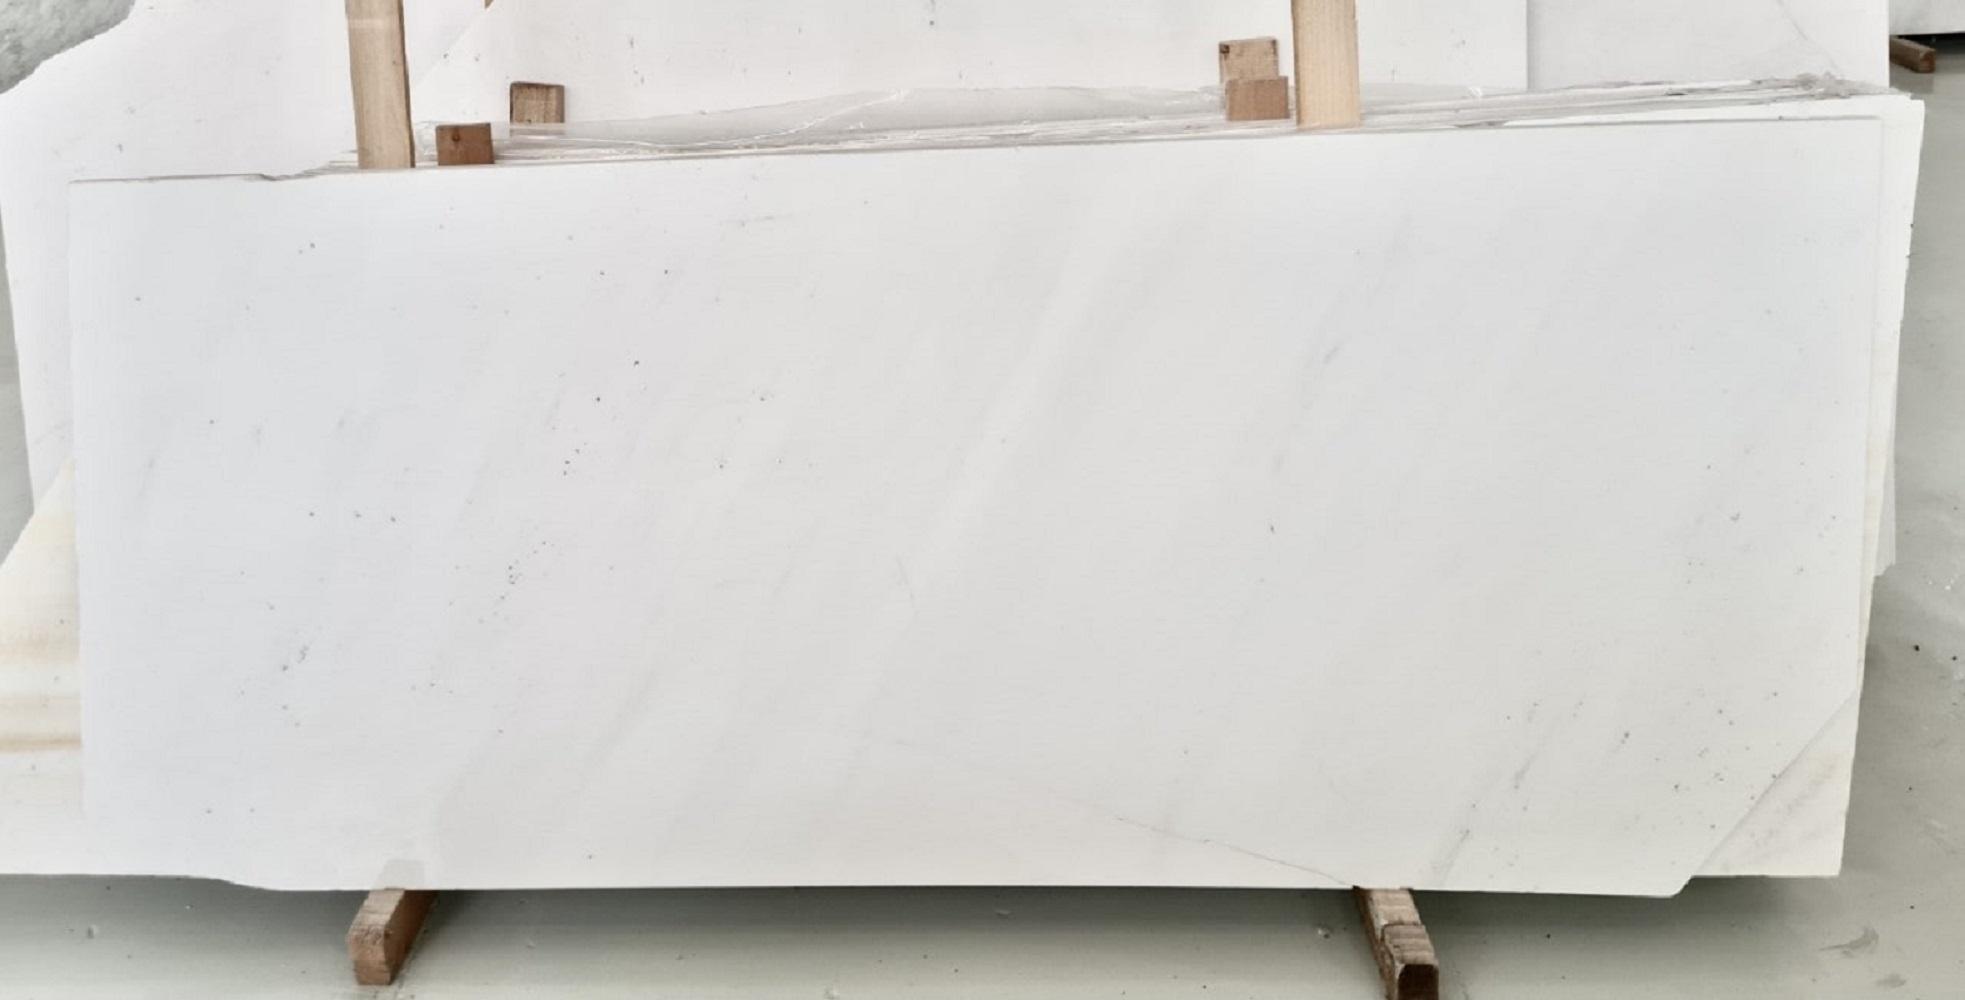 Bianco Sivec - Marmo - Evola Marmi